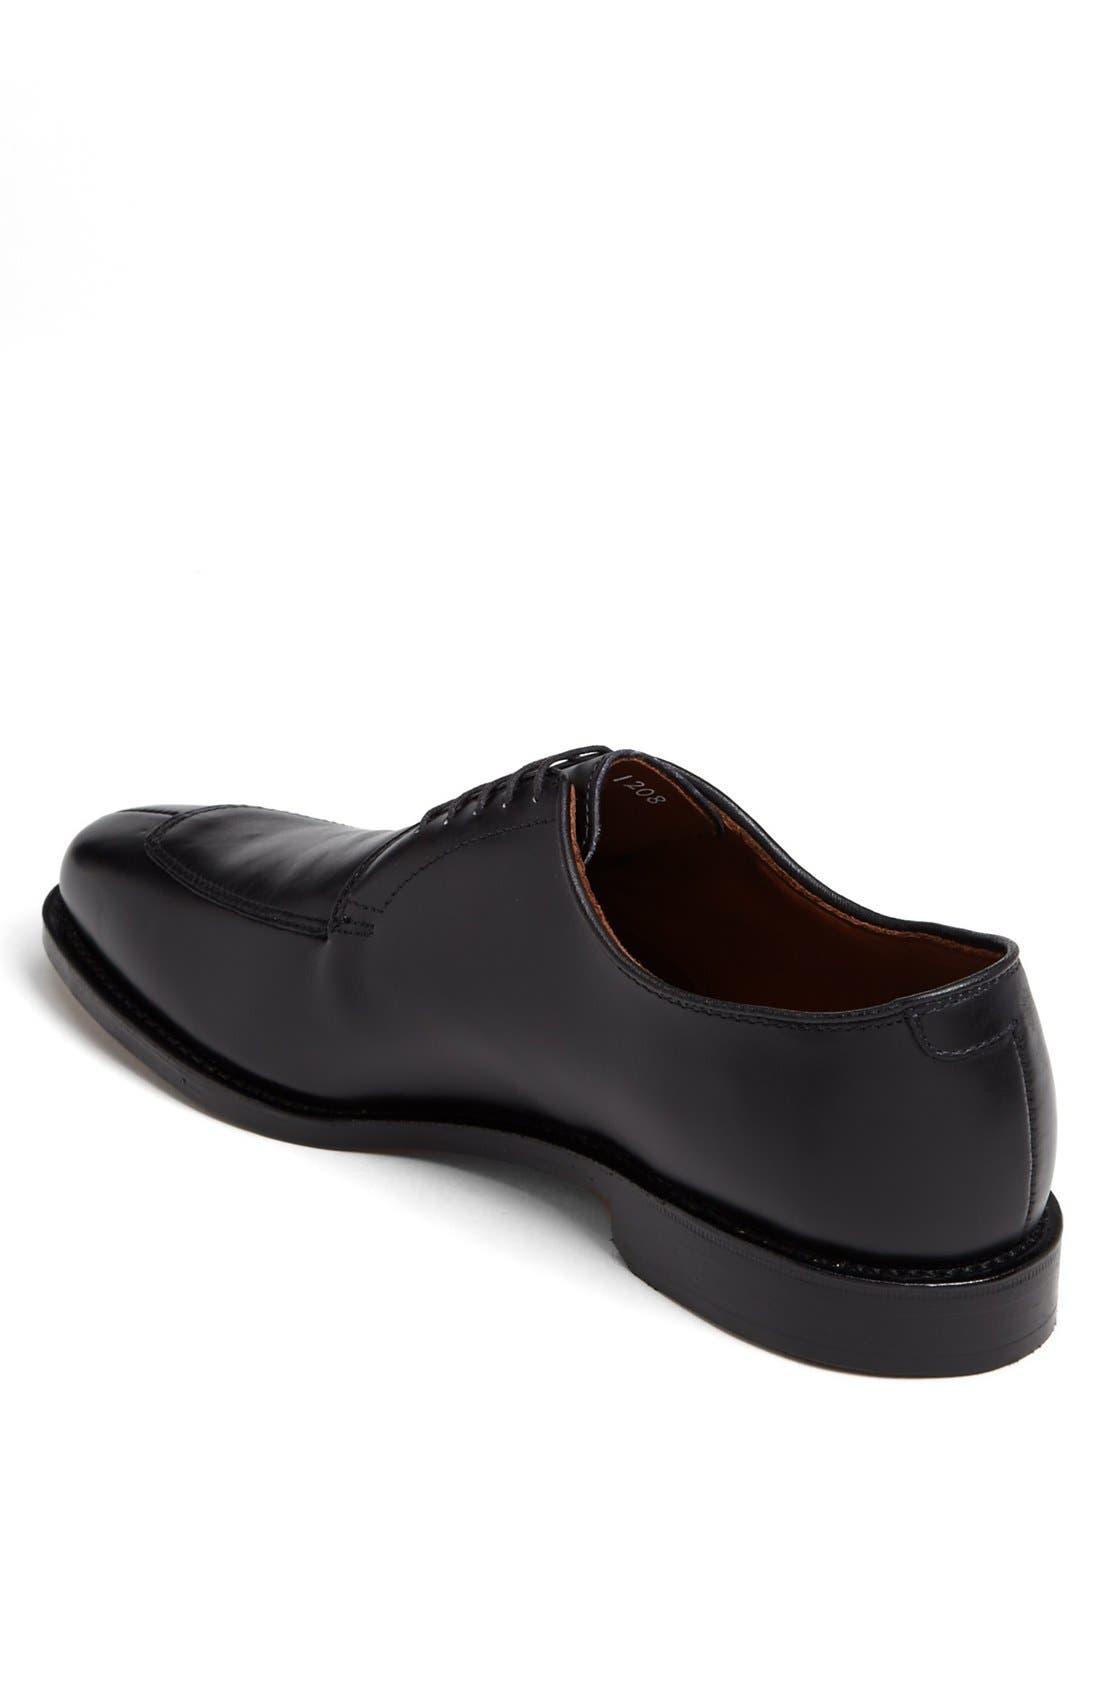 Mens Allen Edmonds Dress Shoes Nordstrom